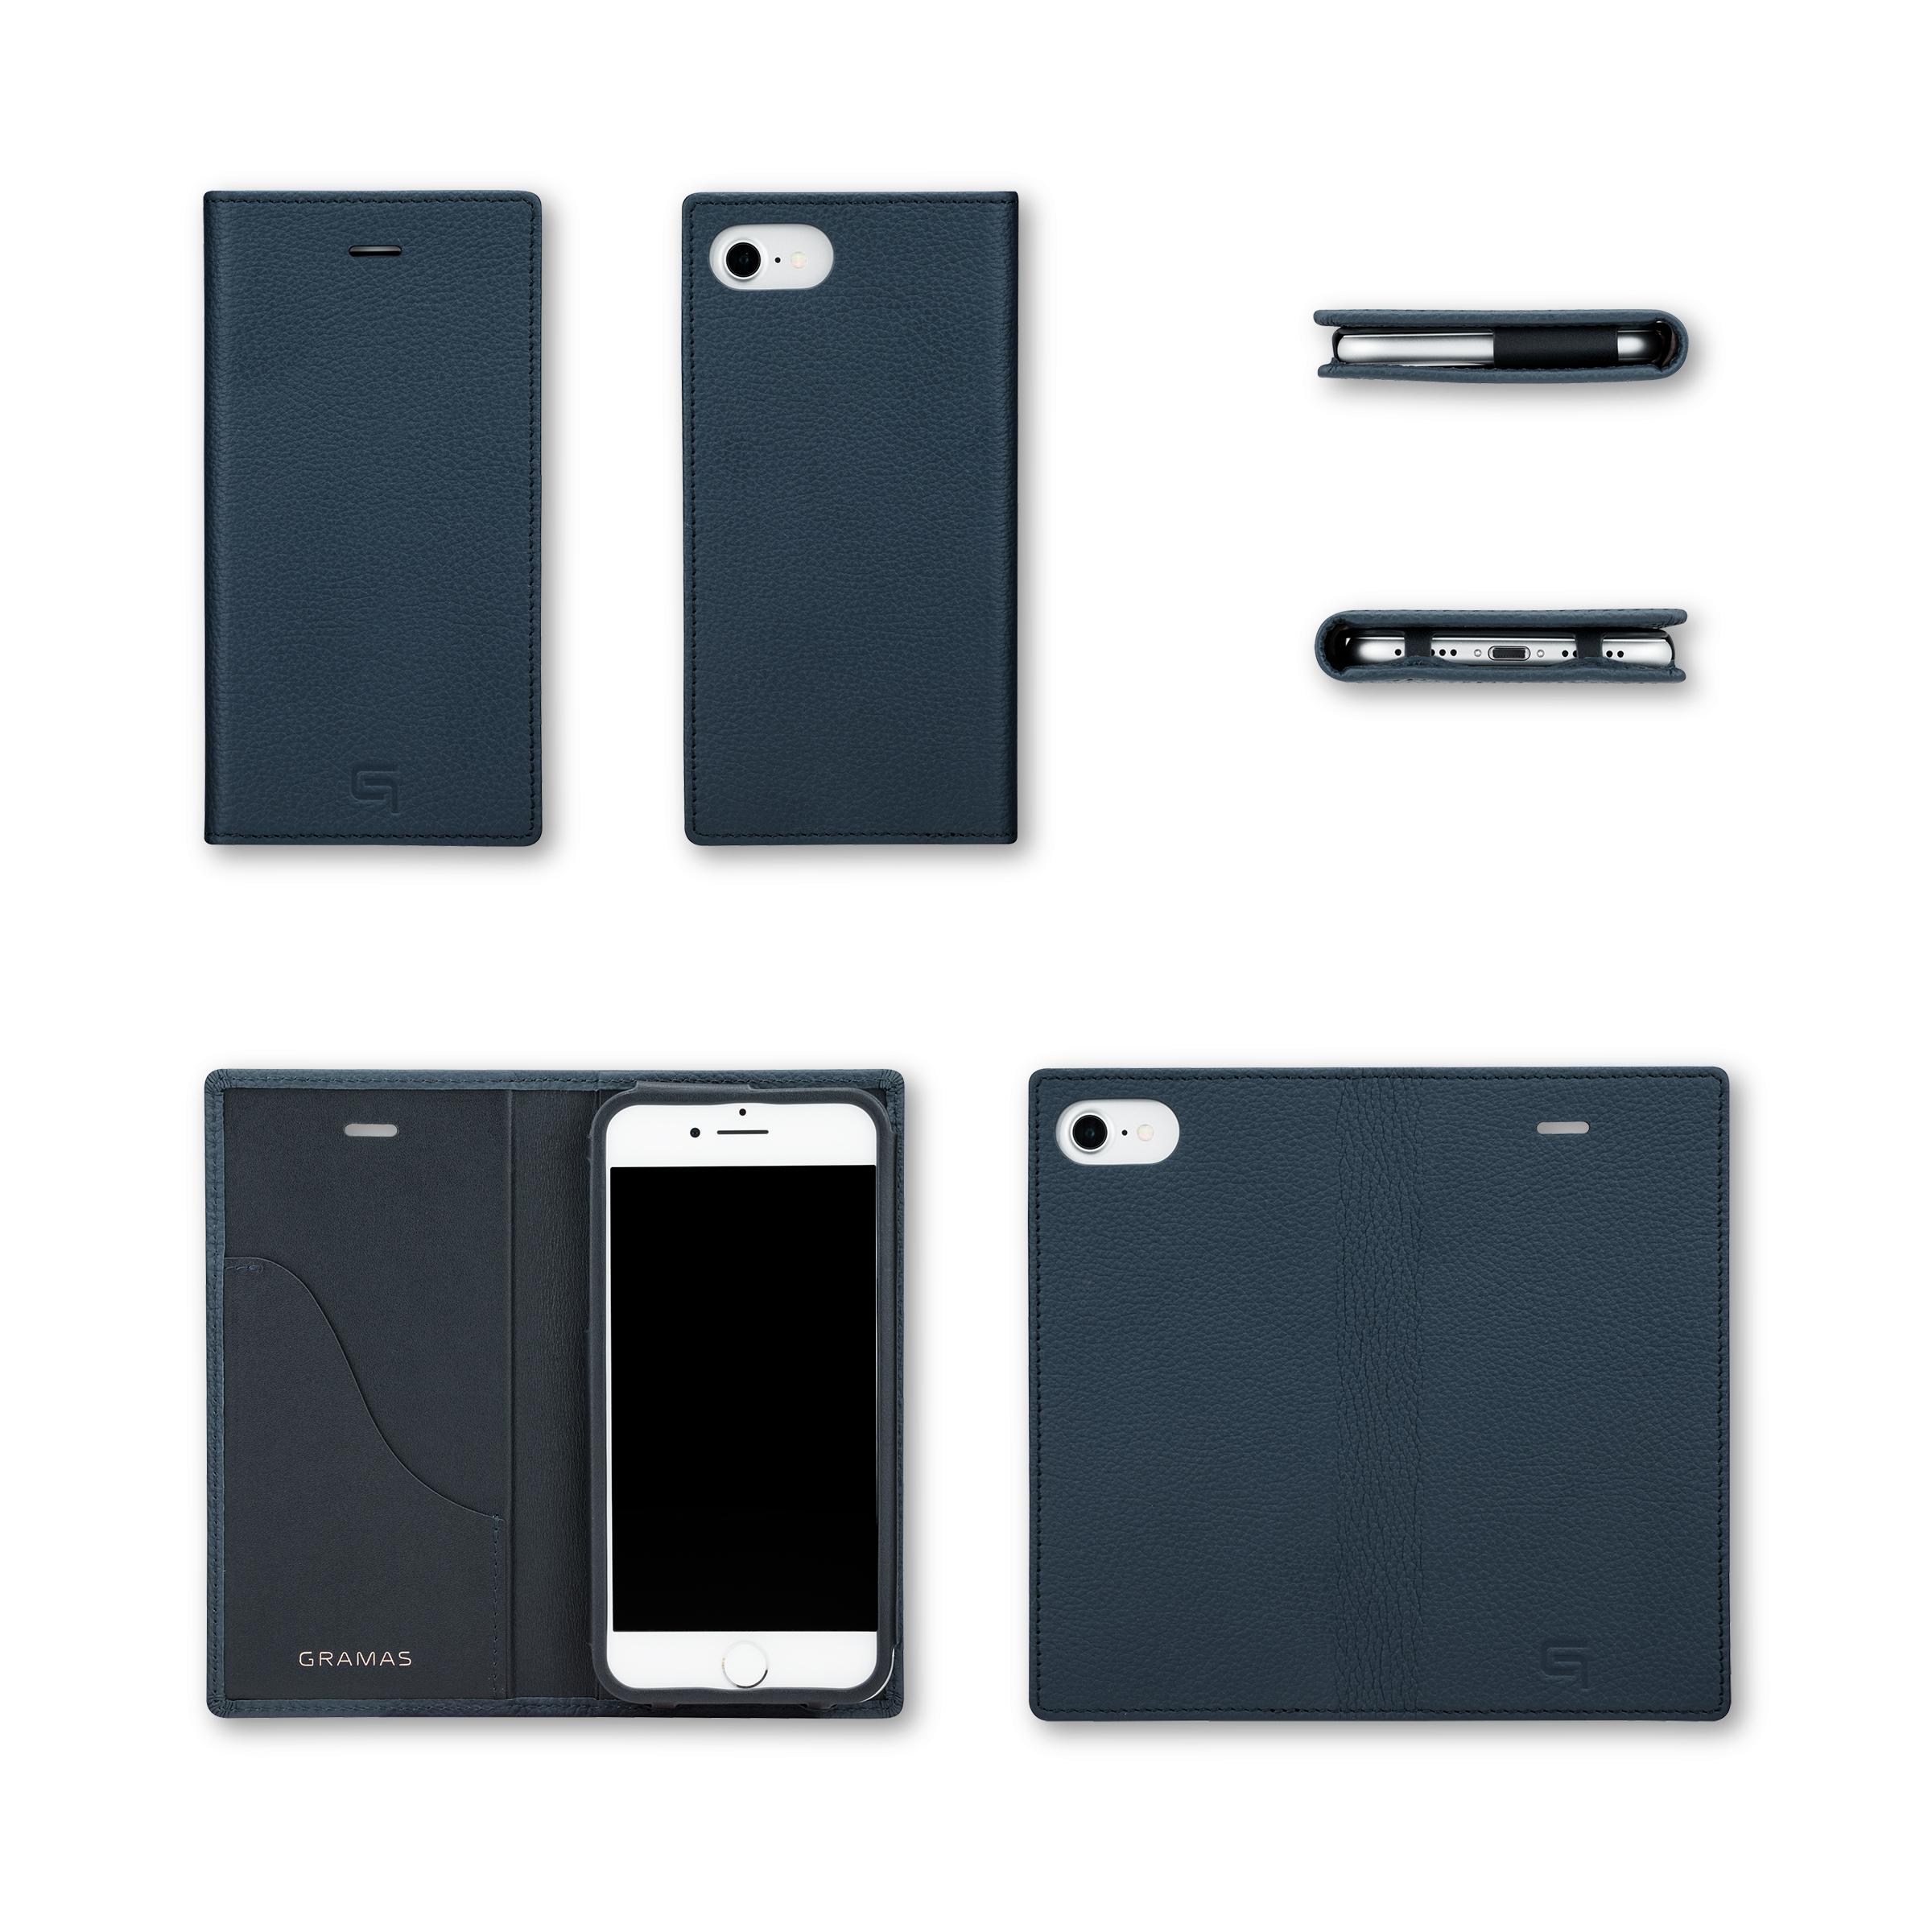 GRAMAS Shrunken-calf Full Leather Case for iPhone 7(Yellow) シュランケンカーフ 手帳型フルレザーケース - 画像5